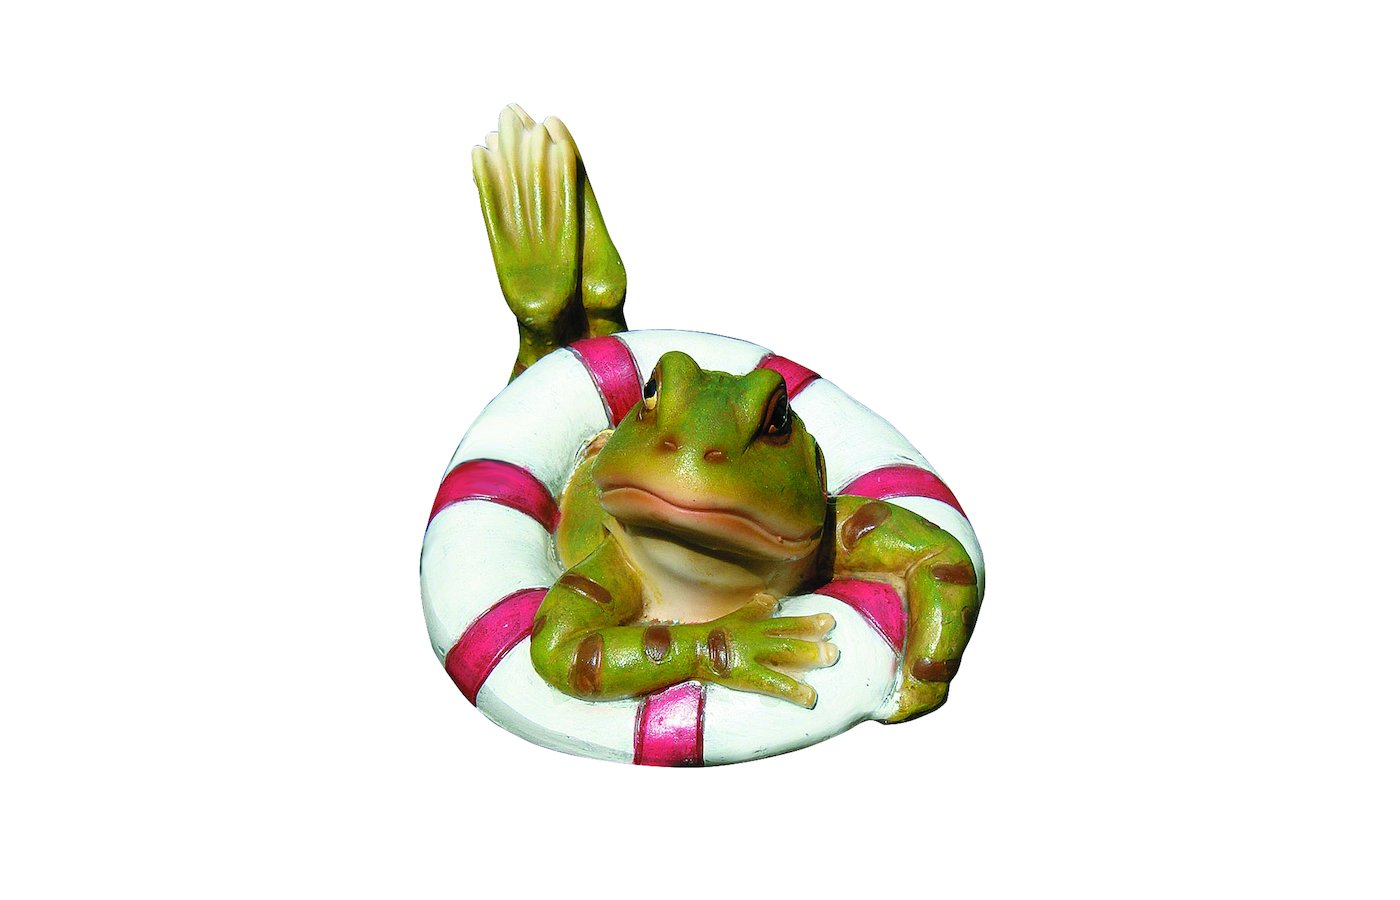 Инвентарь GREEN APPLE GRWD1-17 Фигура плавающая Лягушка